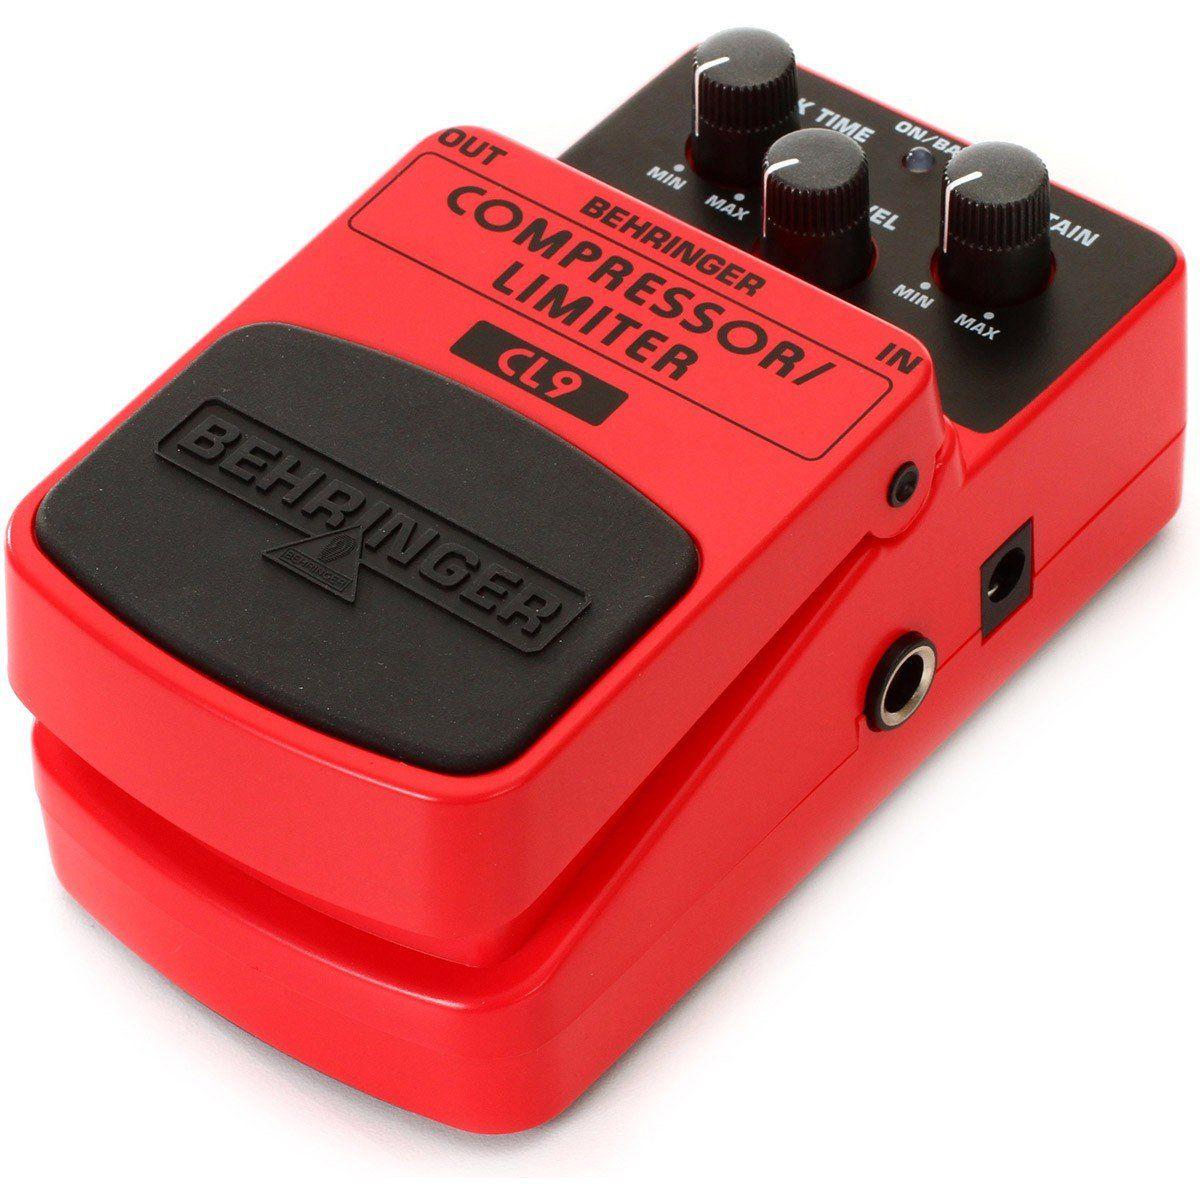 Behringer CL9 Compressor Limiter Pedal para Guitarra